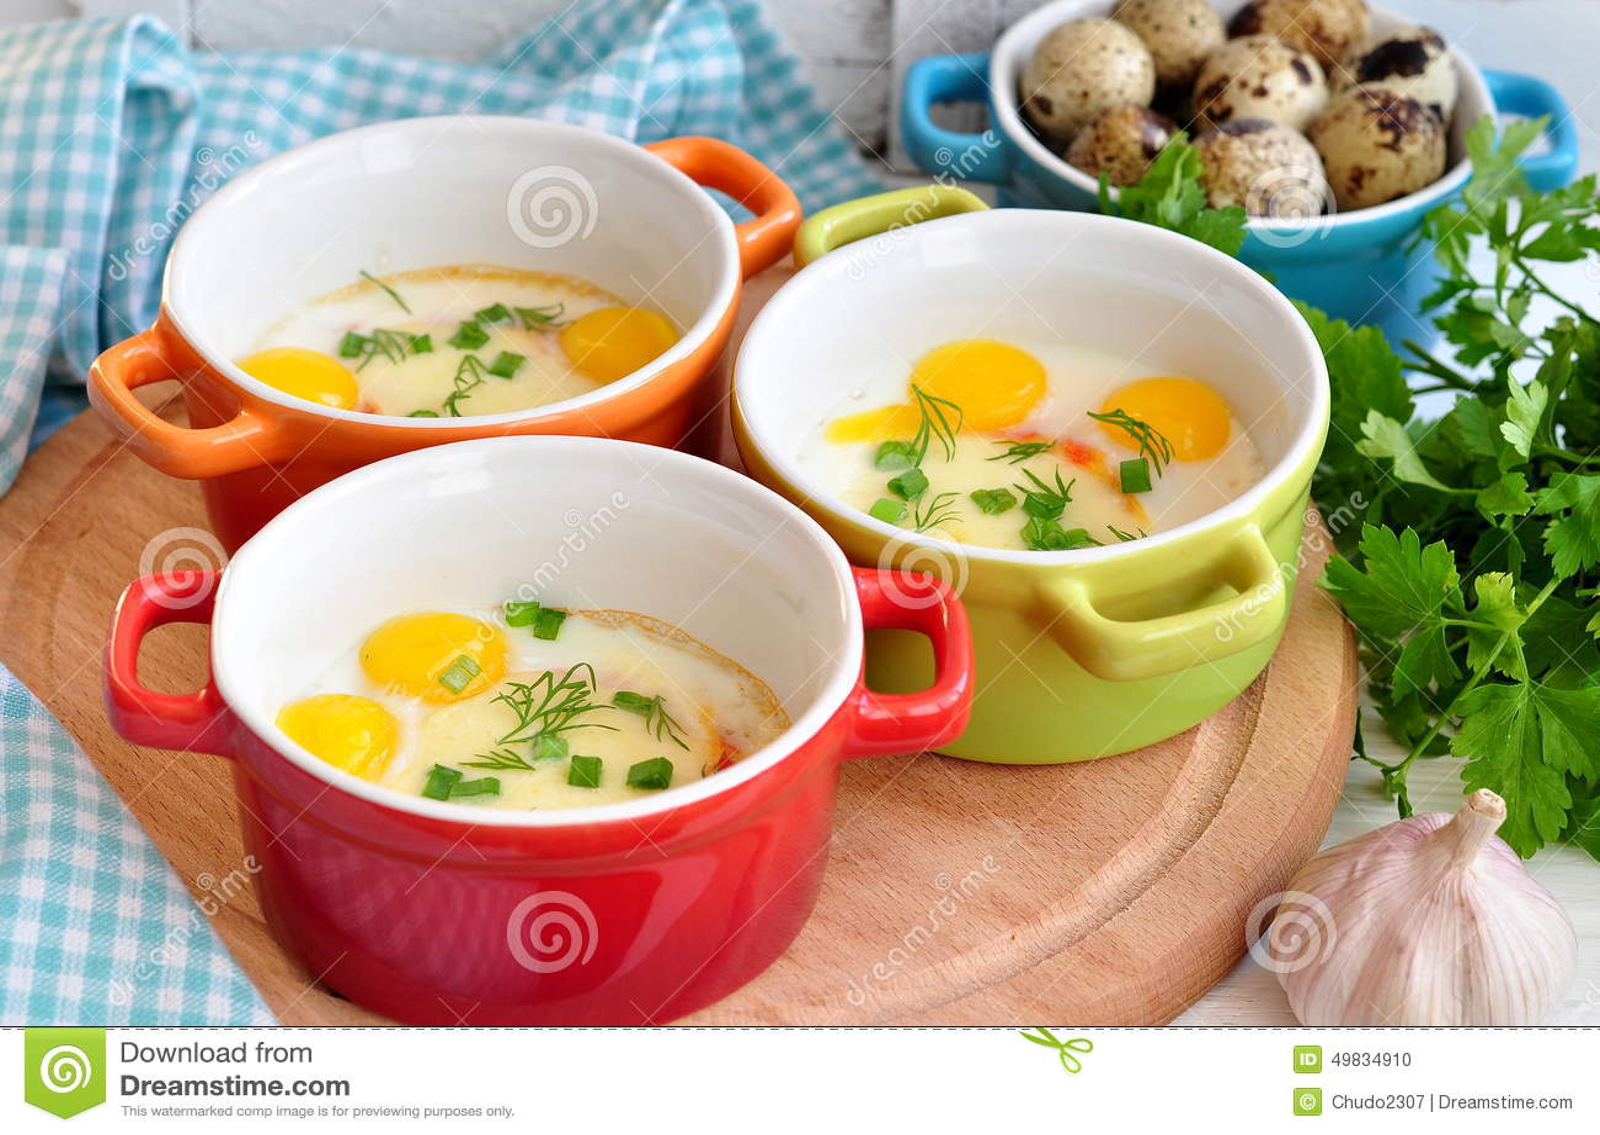 Italian Style, Eggs Baked With Mozzarella And Green Onion, Stock Photo ...